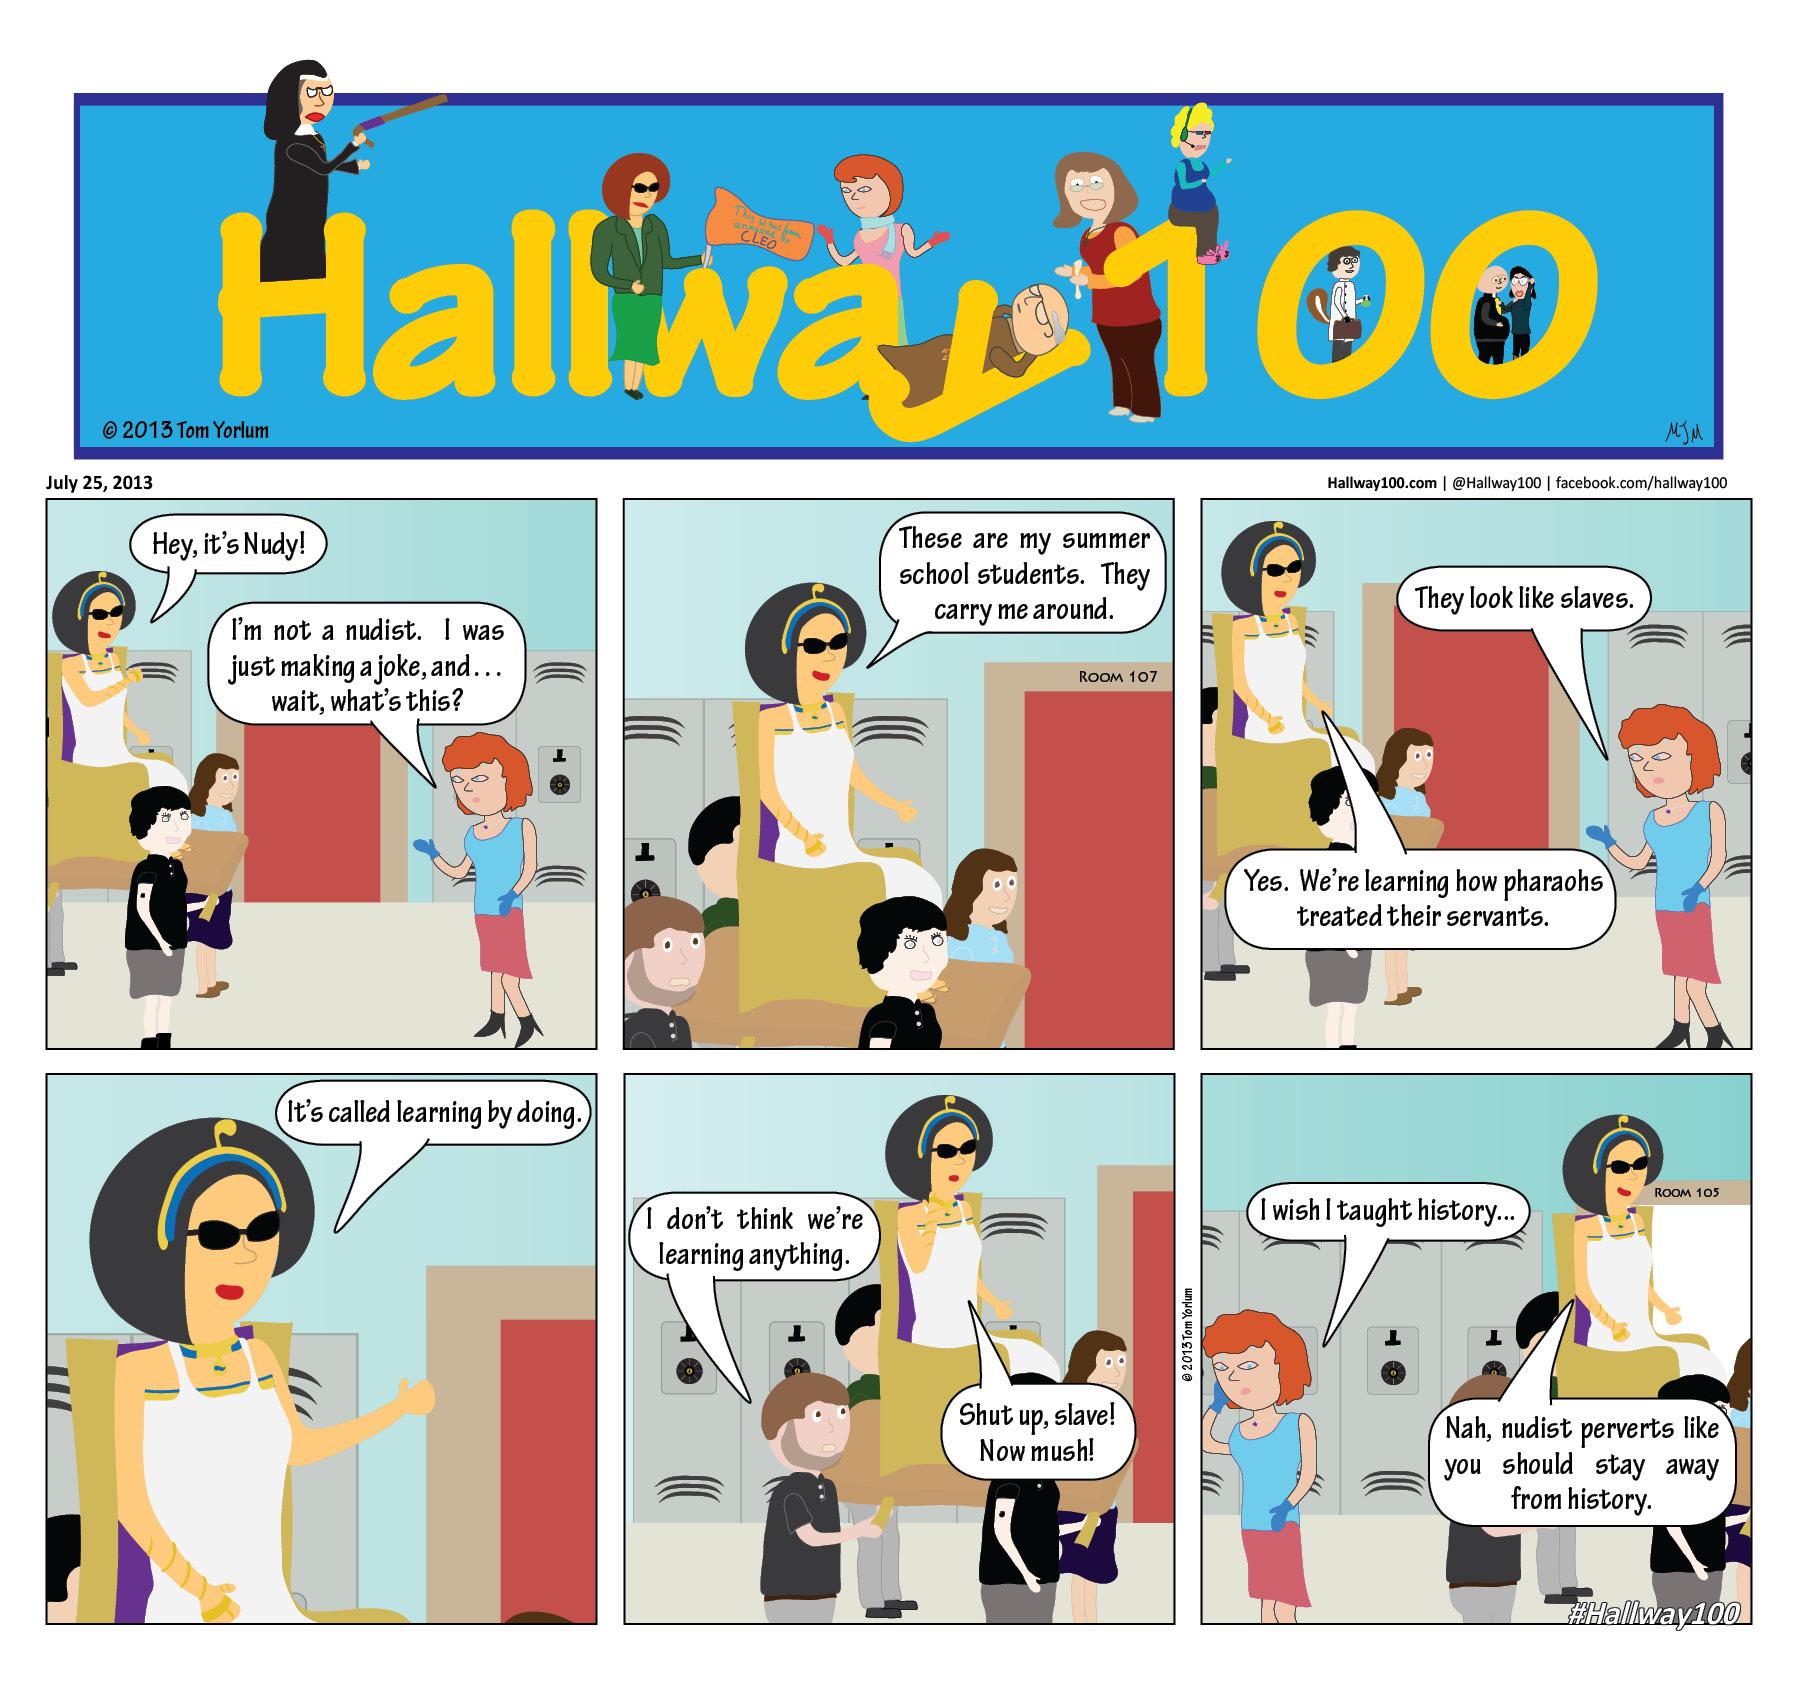 #hallway100